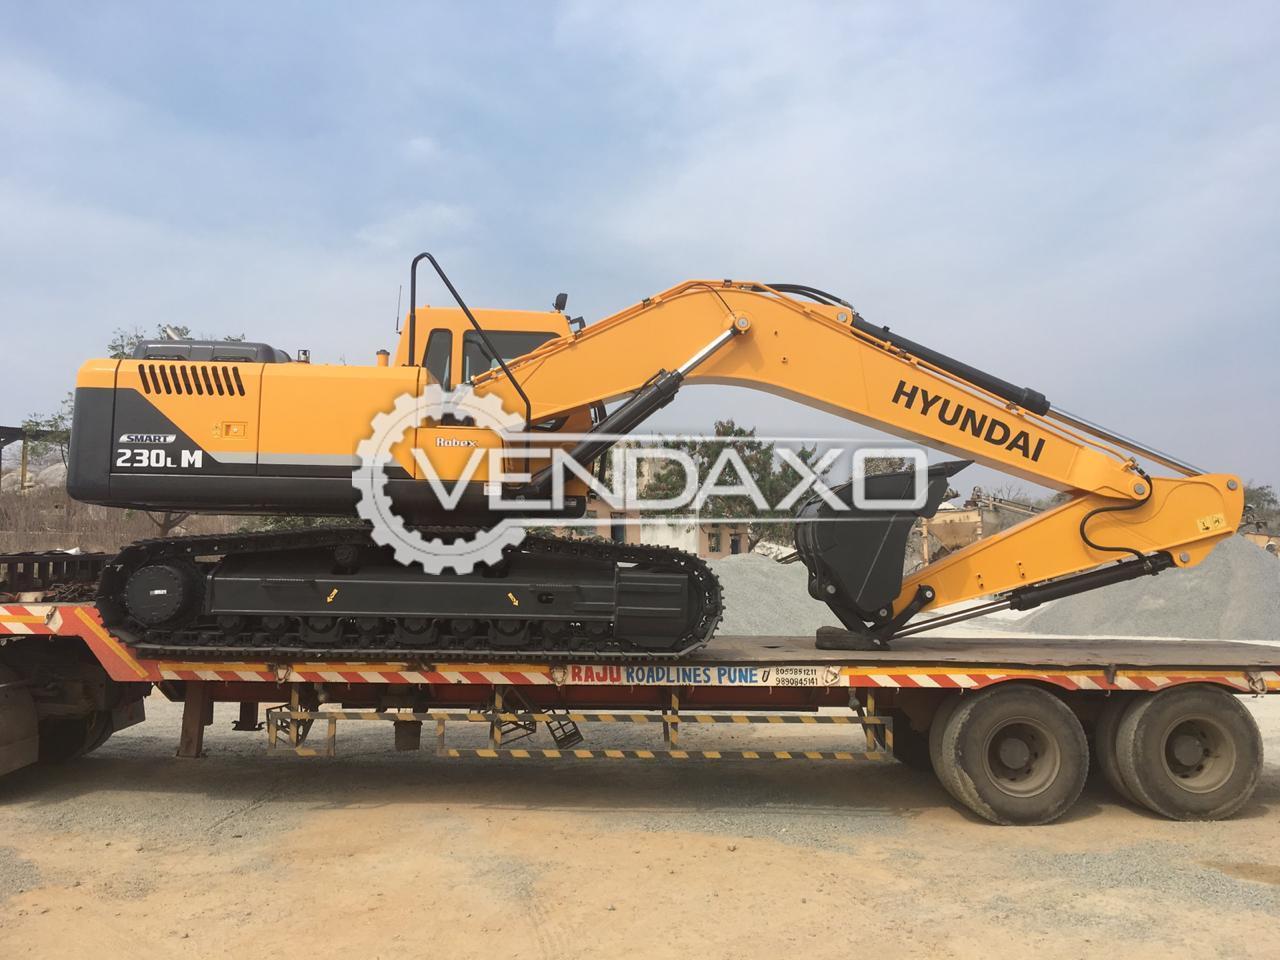 Hyundai 230LM Smart Excavator - 148 HP